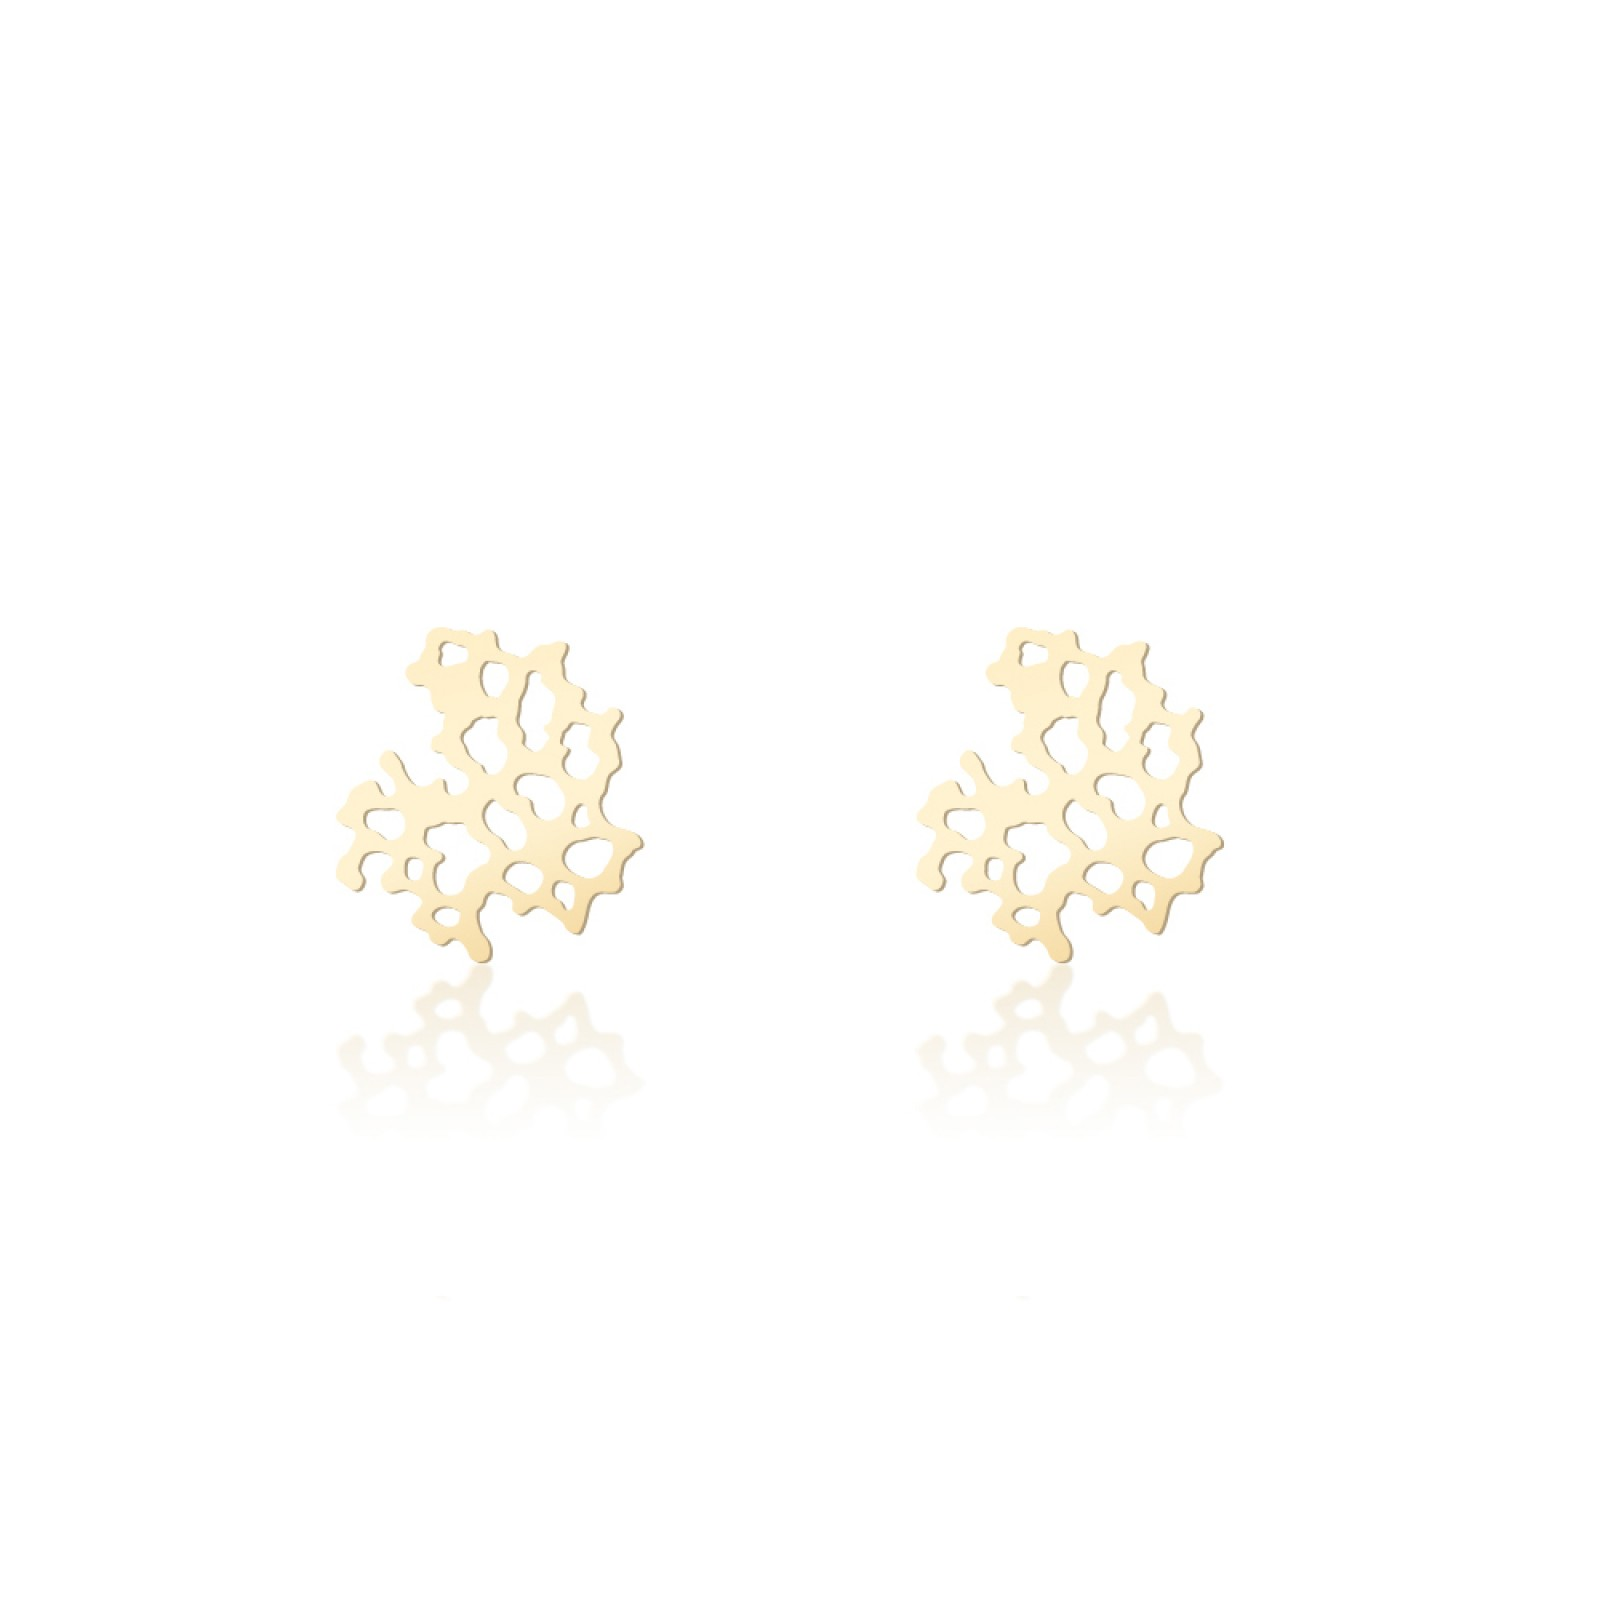 Weathered Rock Earrings XS (Gold) - Moorigin